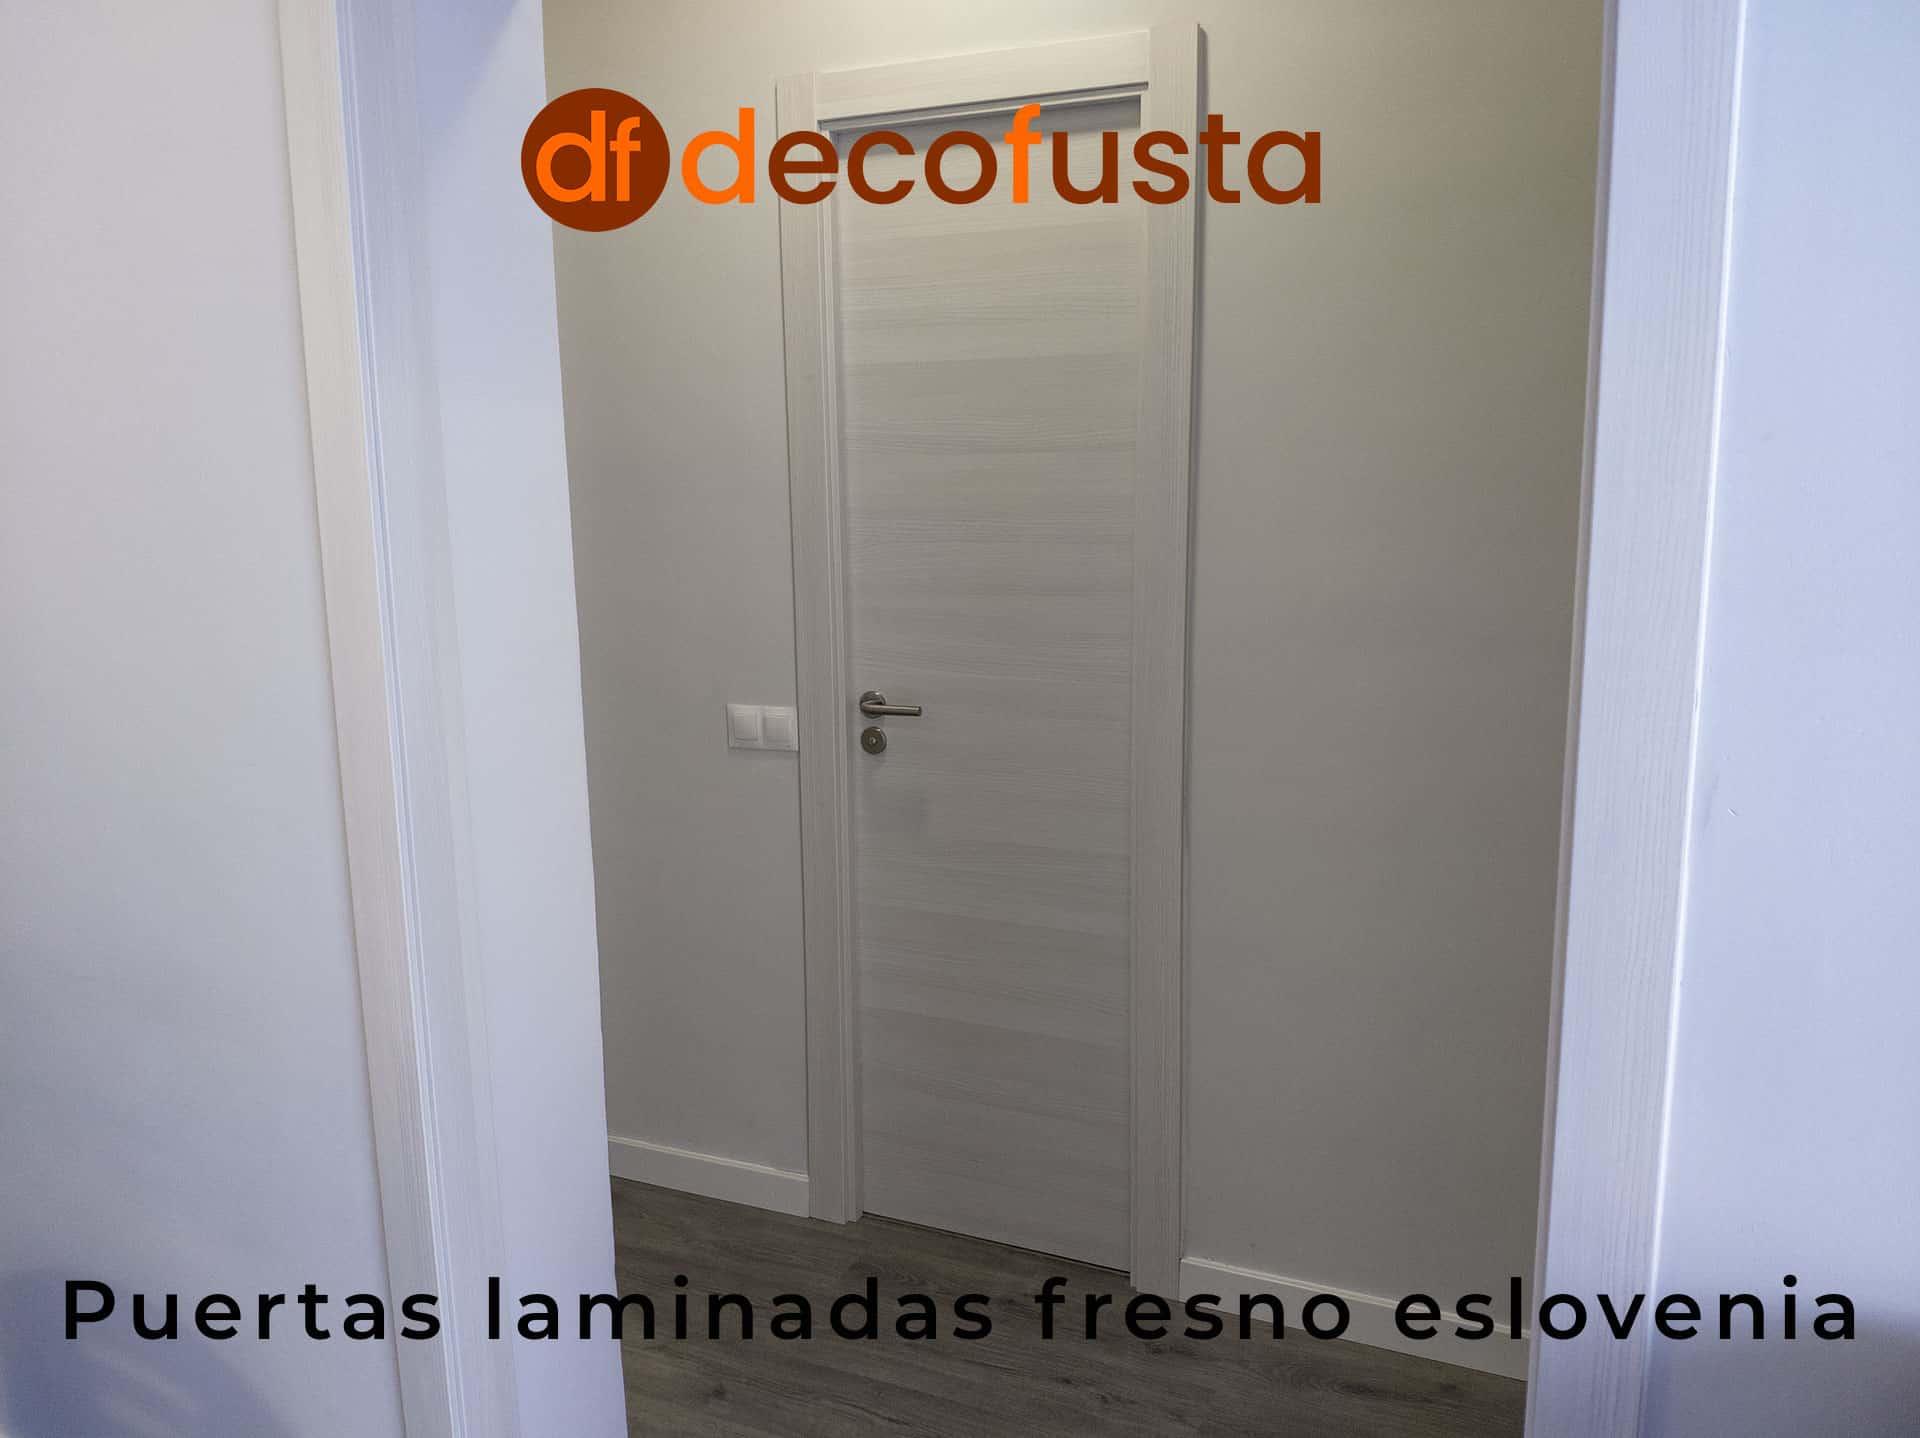 Puertas laminadas fresno eslovenia